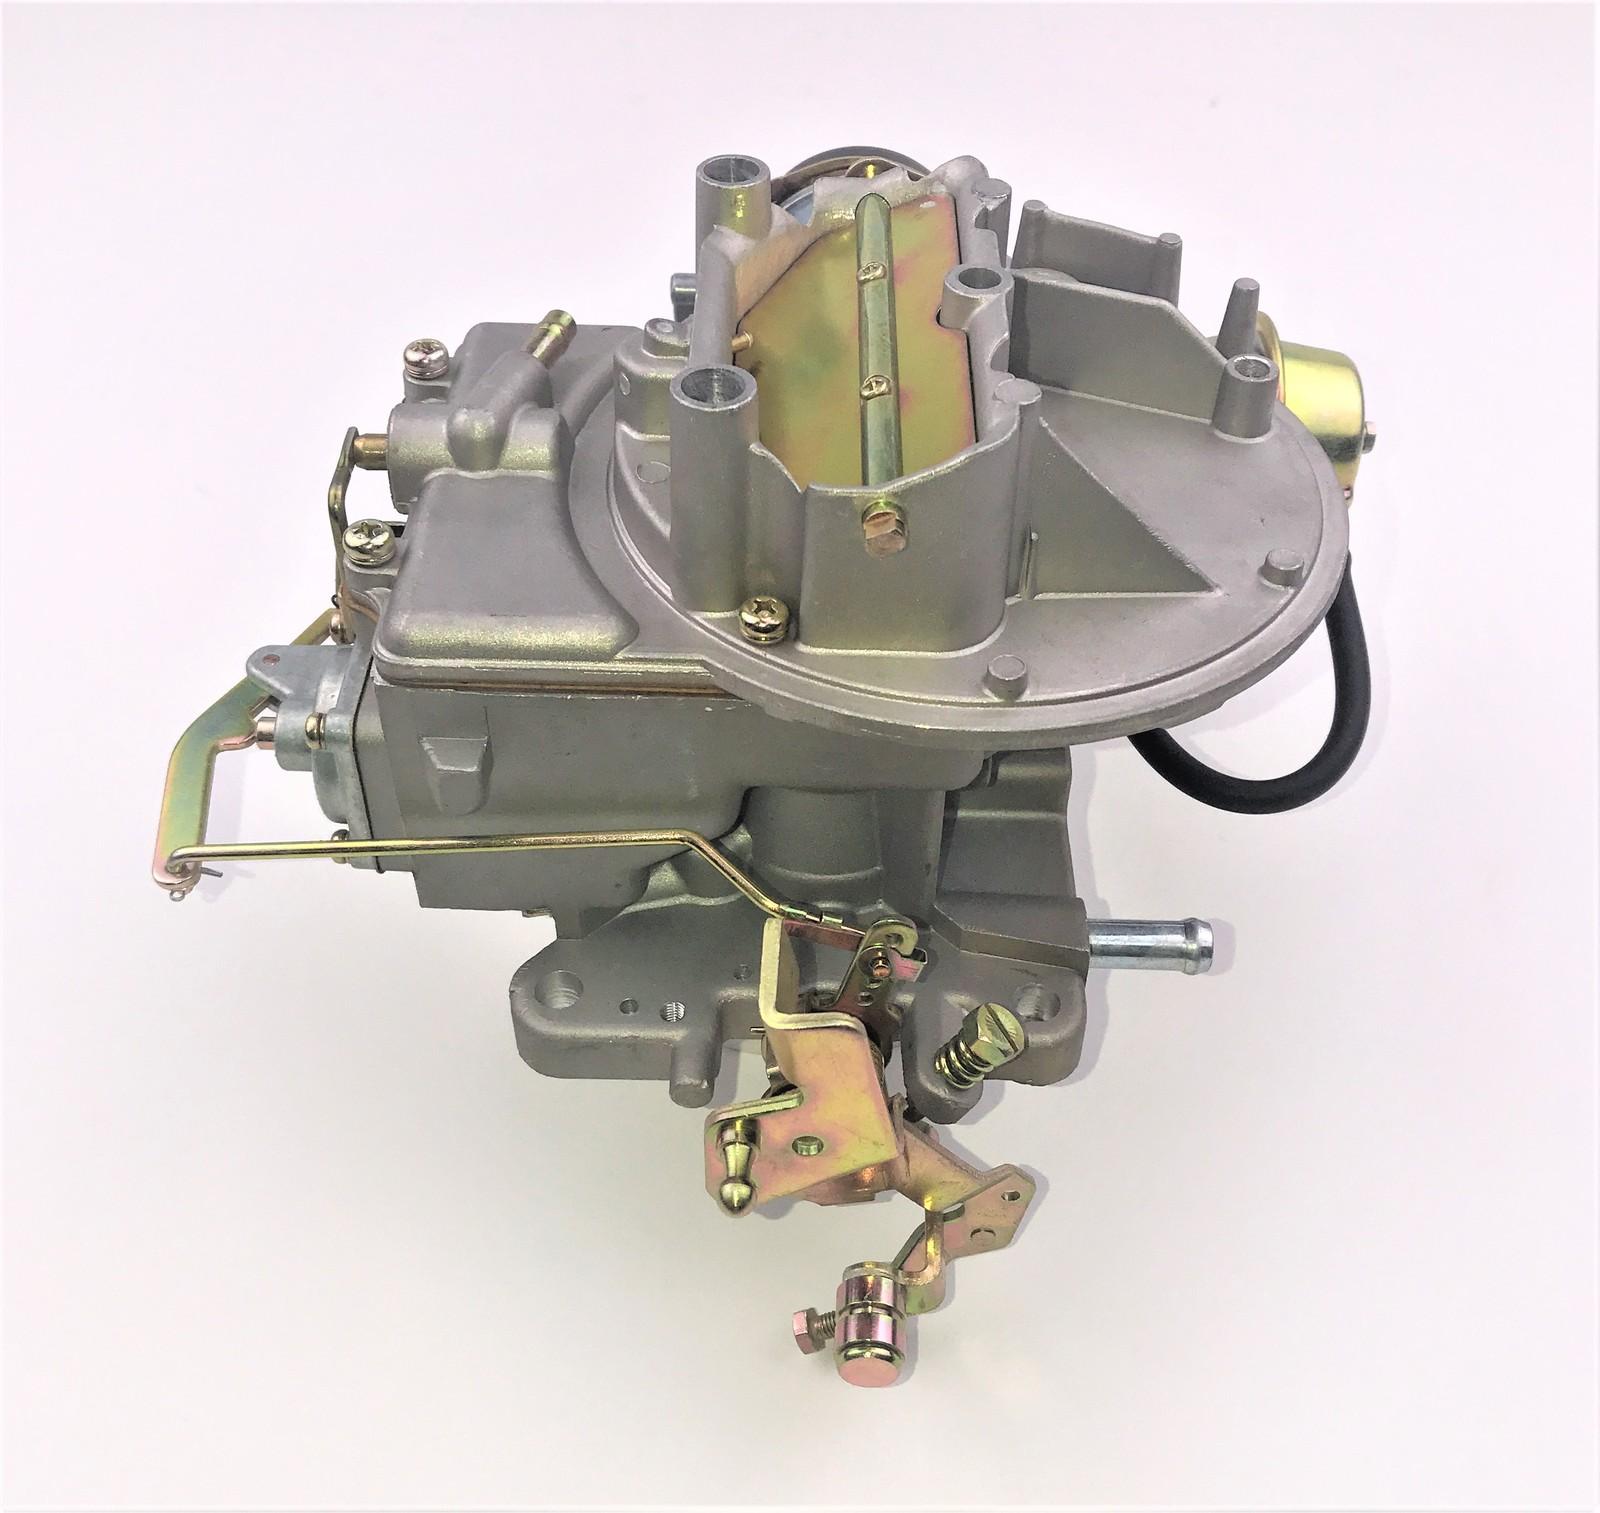 carburetor barrel ford 289 302 2100 360 team carb jeep performance parts items truck engines seller